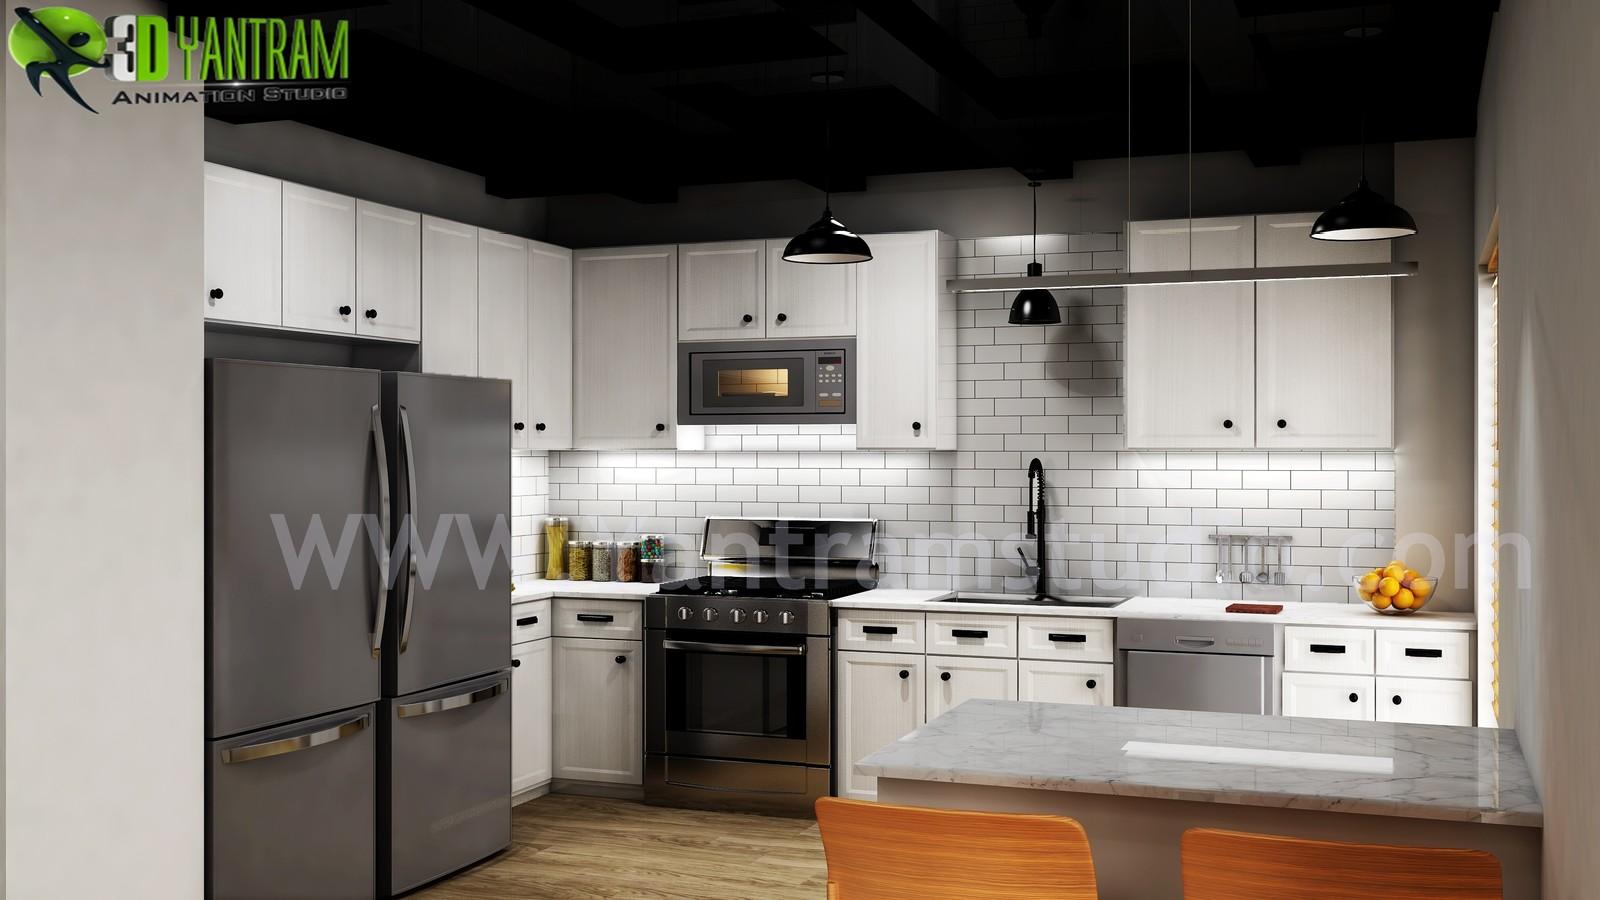 ArtStation   Modern Small Kitchen Design Ideas by Yantram 9d ...